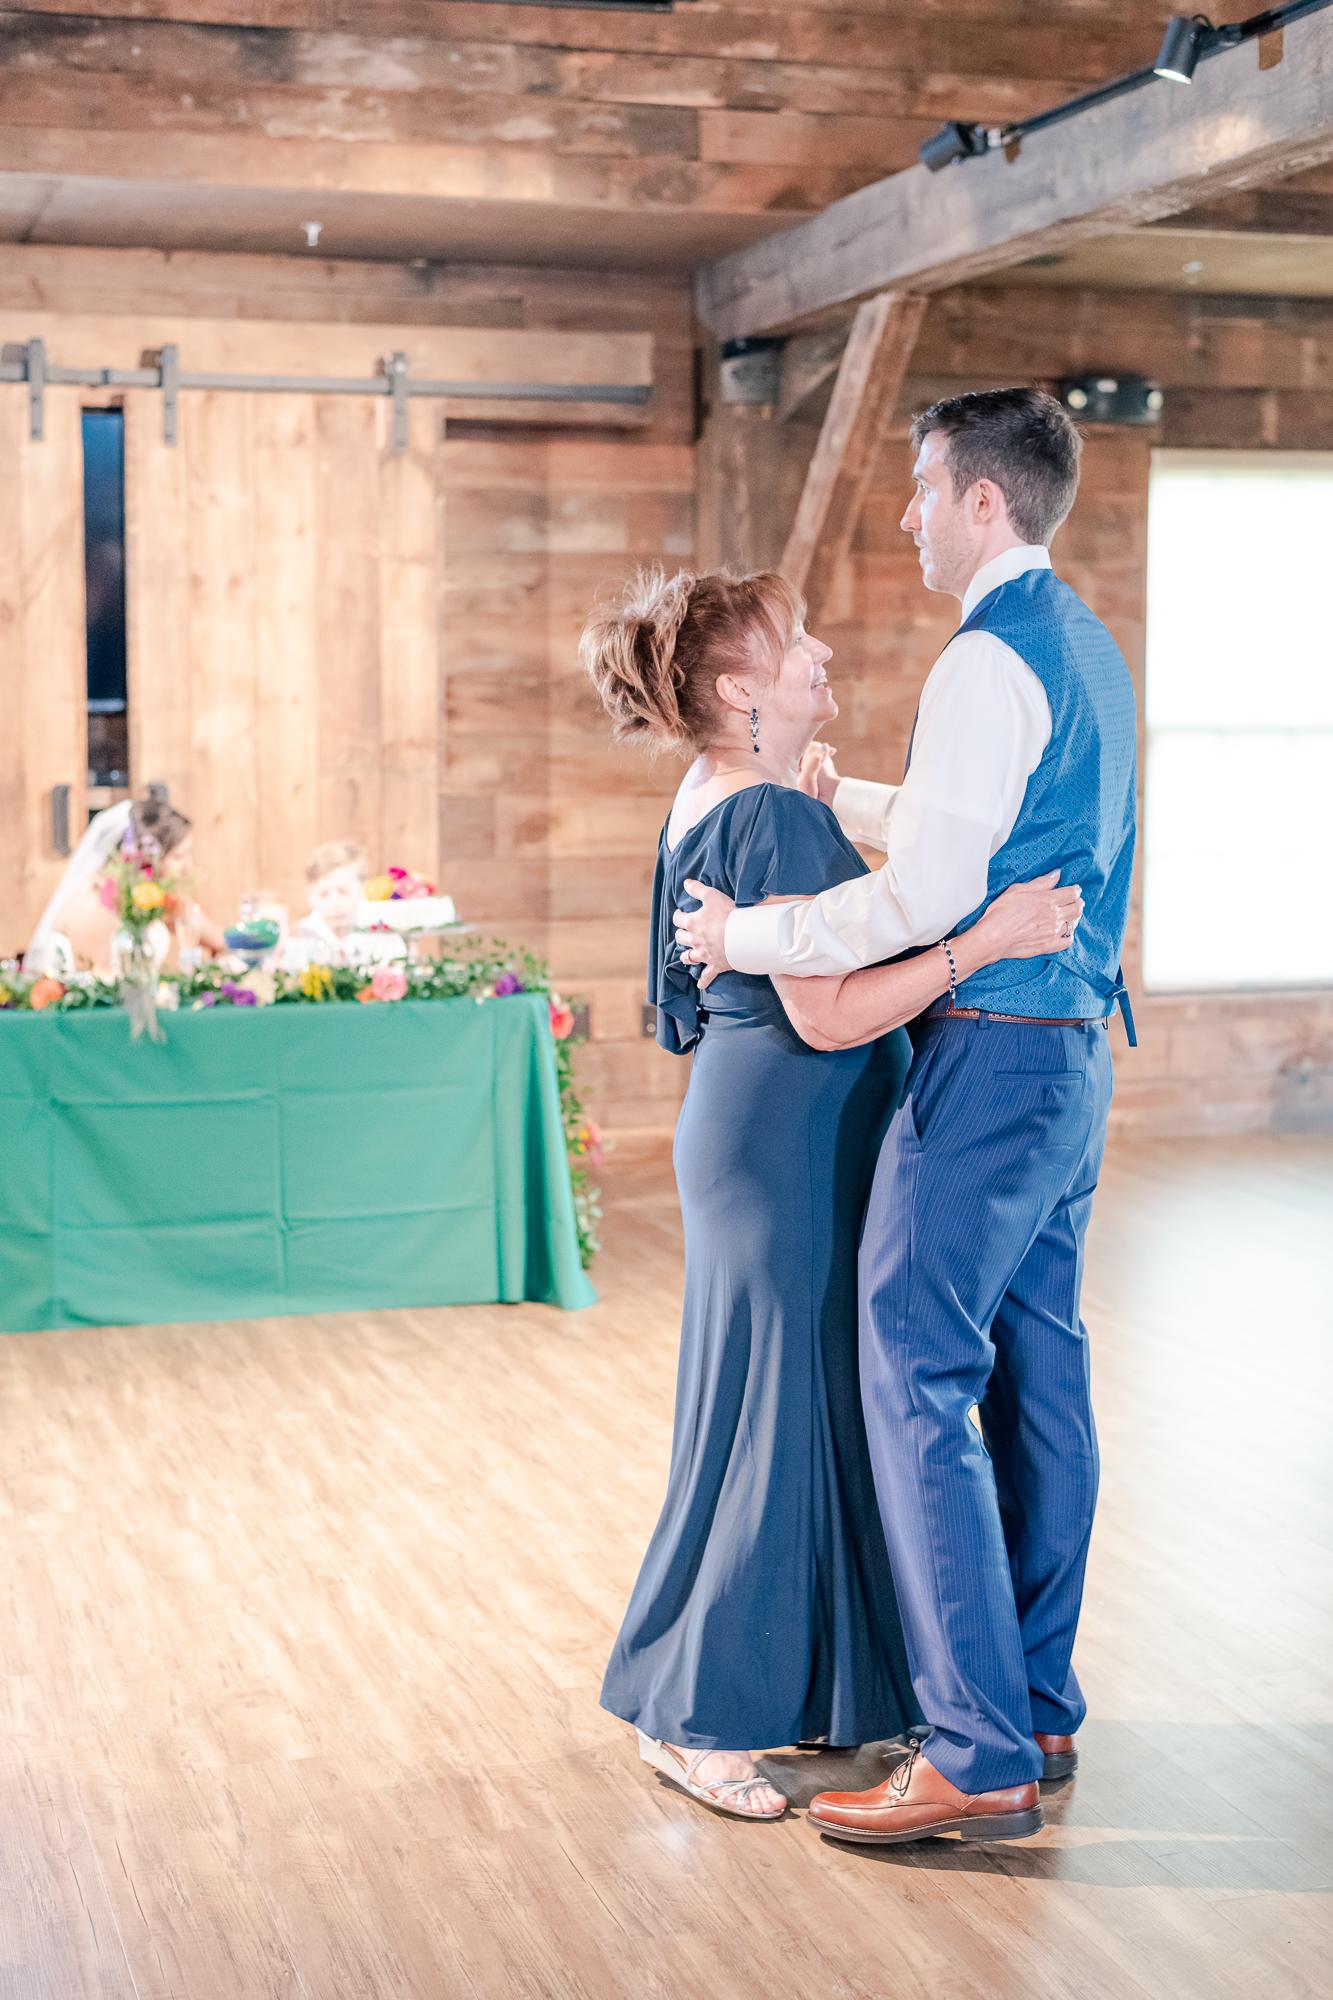 Maria+Adam_Summer Barn Wedding_The Barn at The North Star Preserve_Oberlin_Ohio-201.jpg